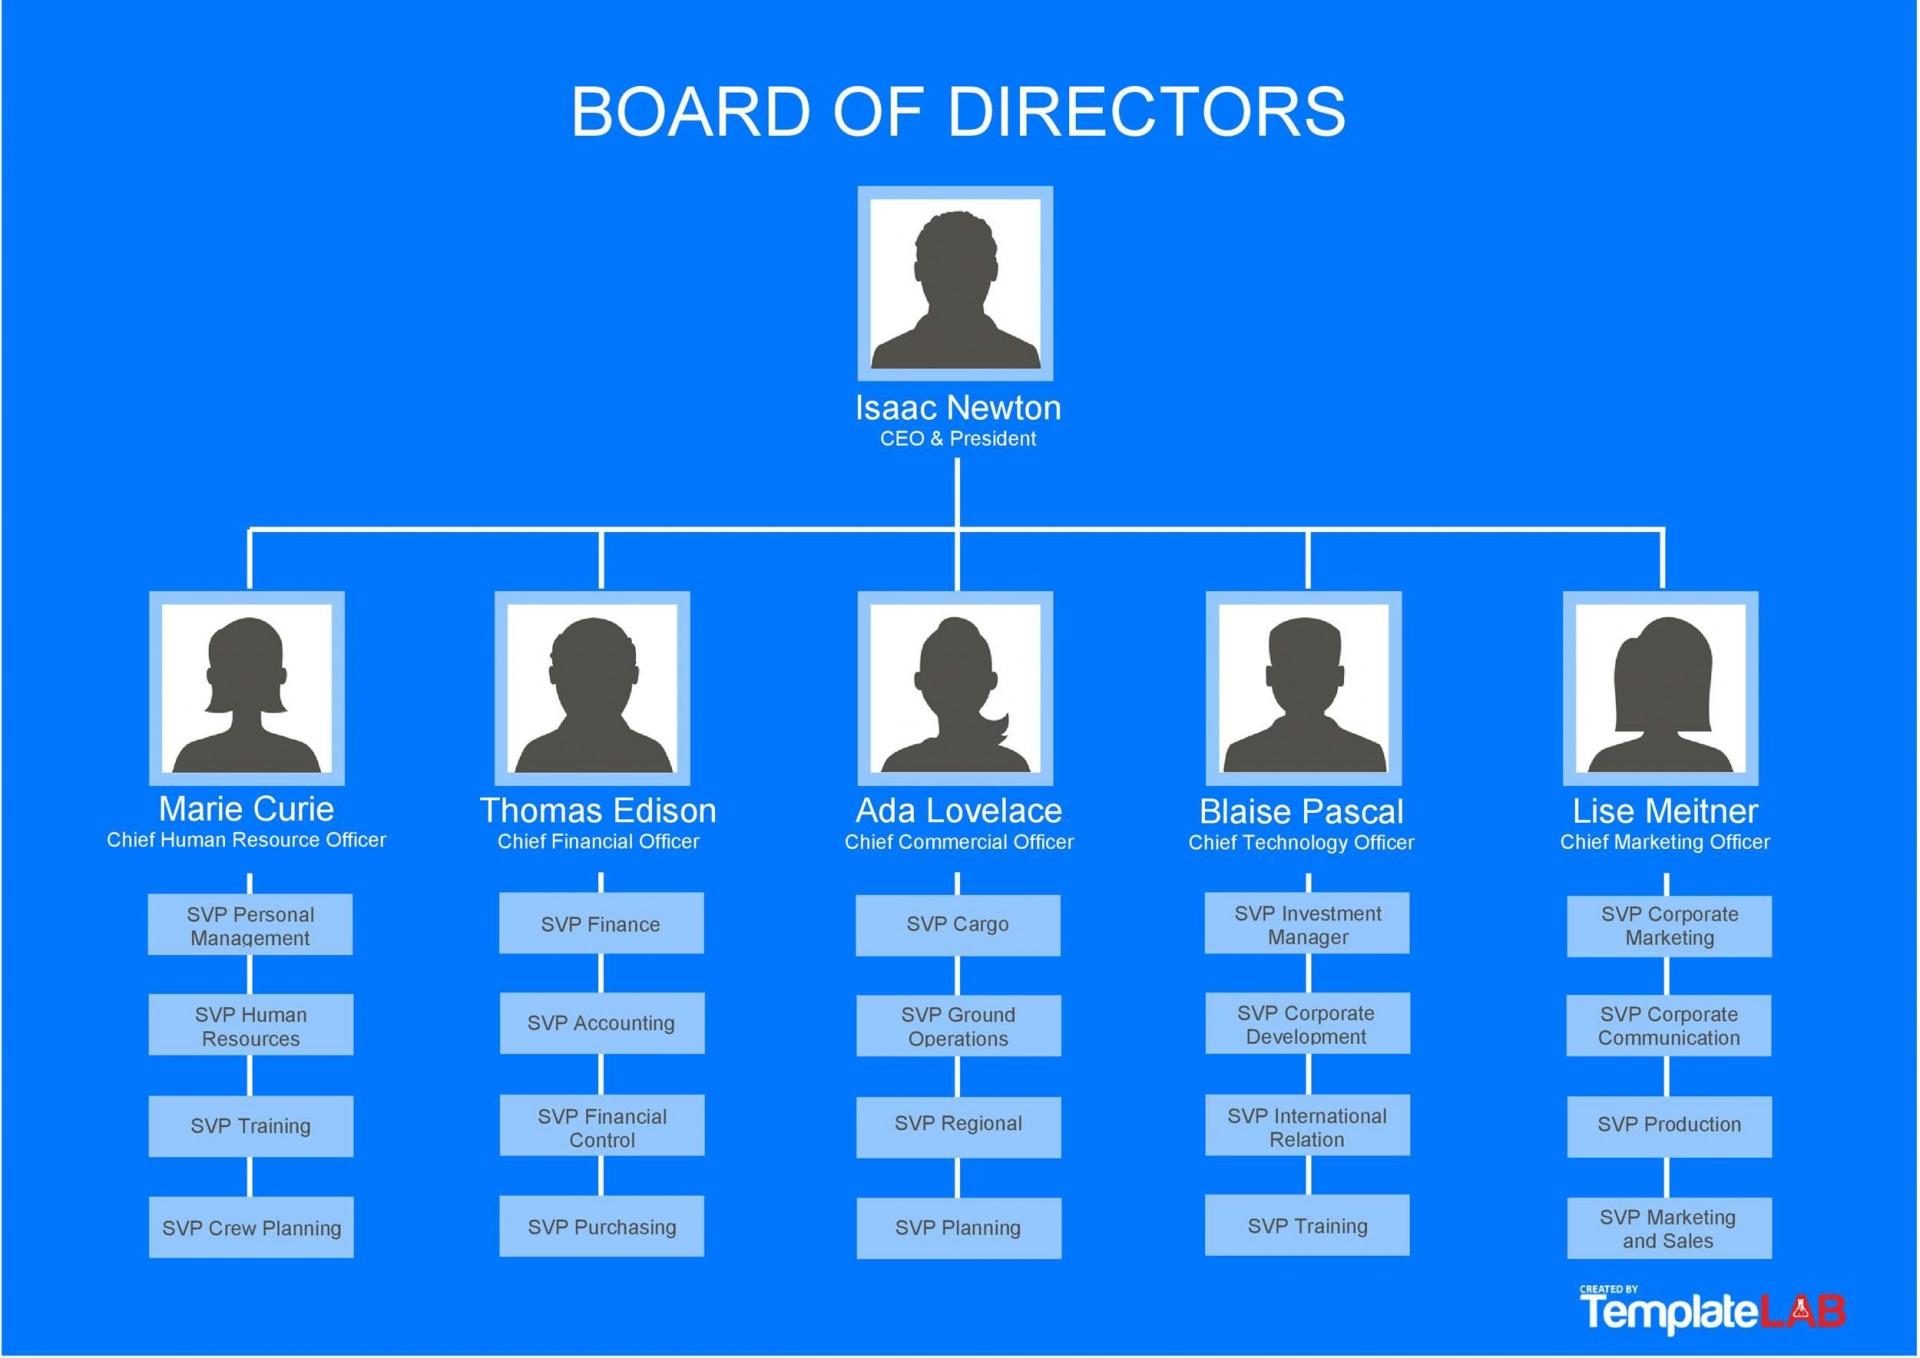 001 Stirring Organizational Chart Template Word Image  2013 2010 20071920